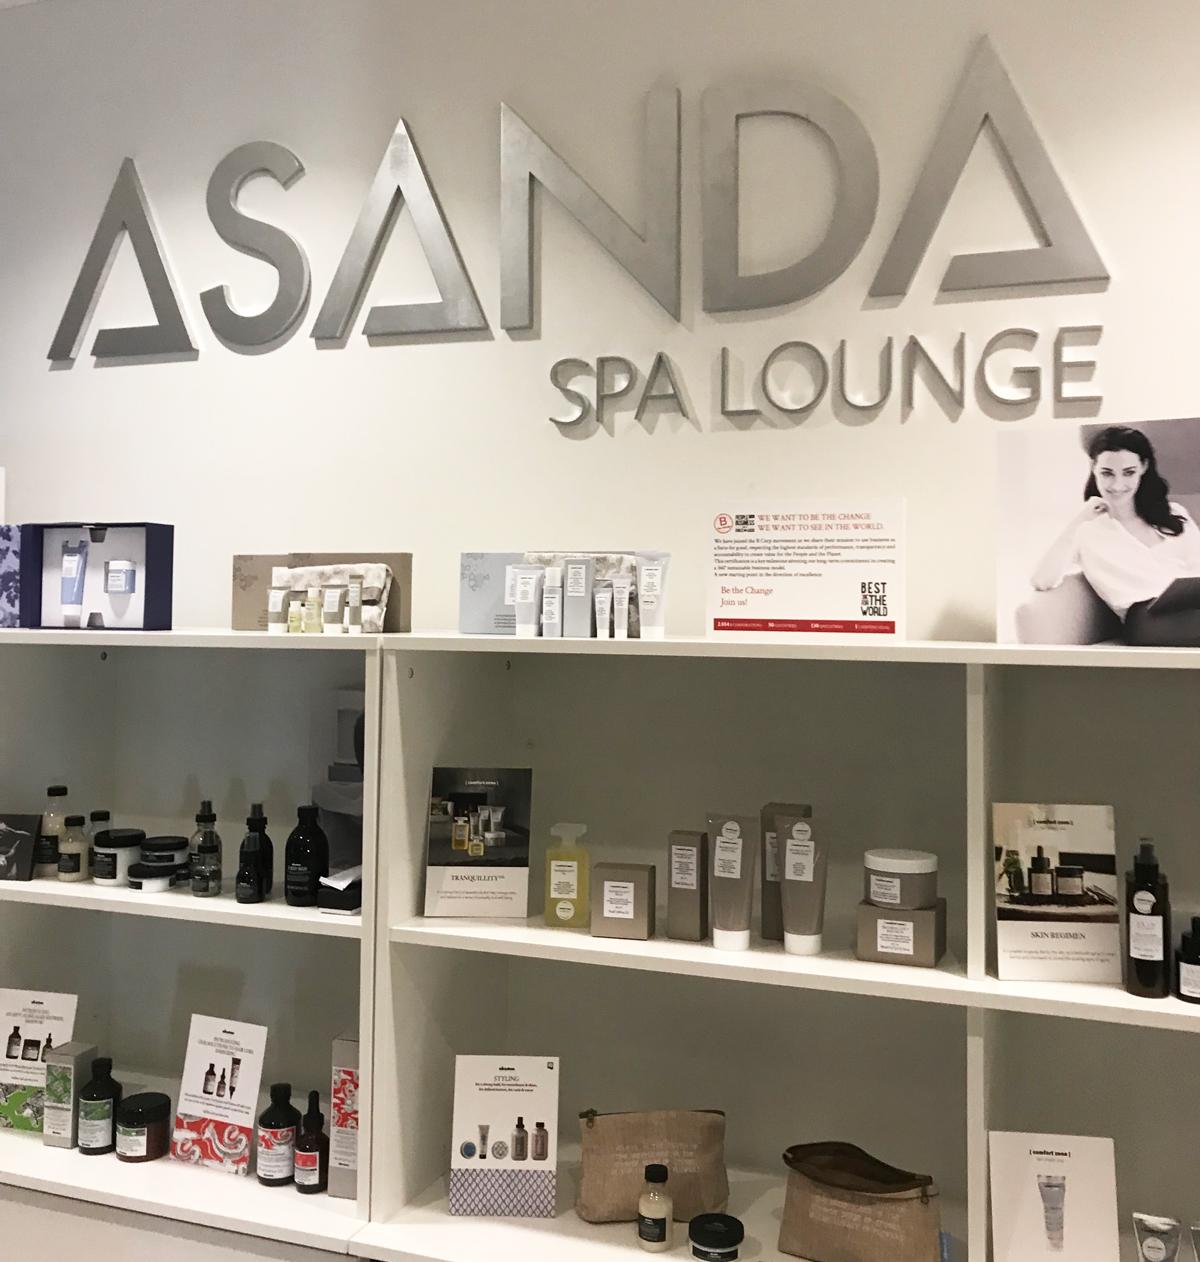 Asanda Spa Lounge Delta Sky Club Atlanta